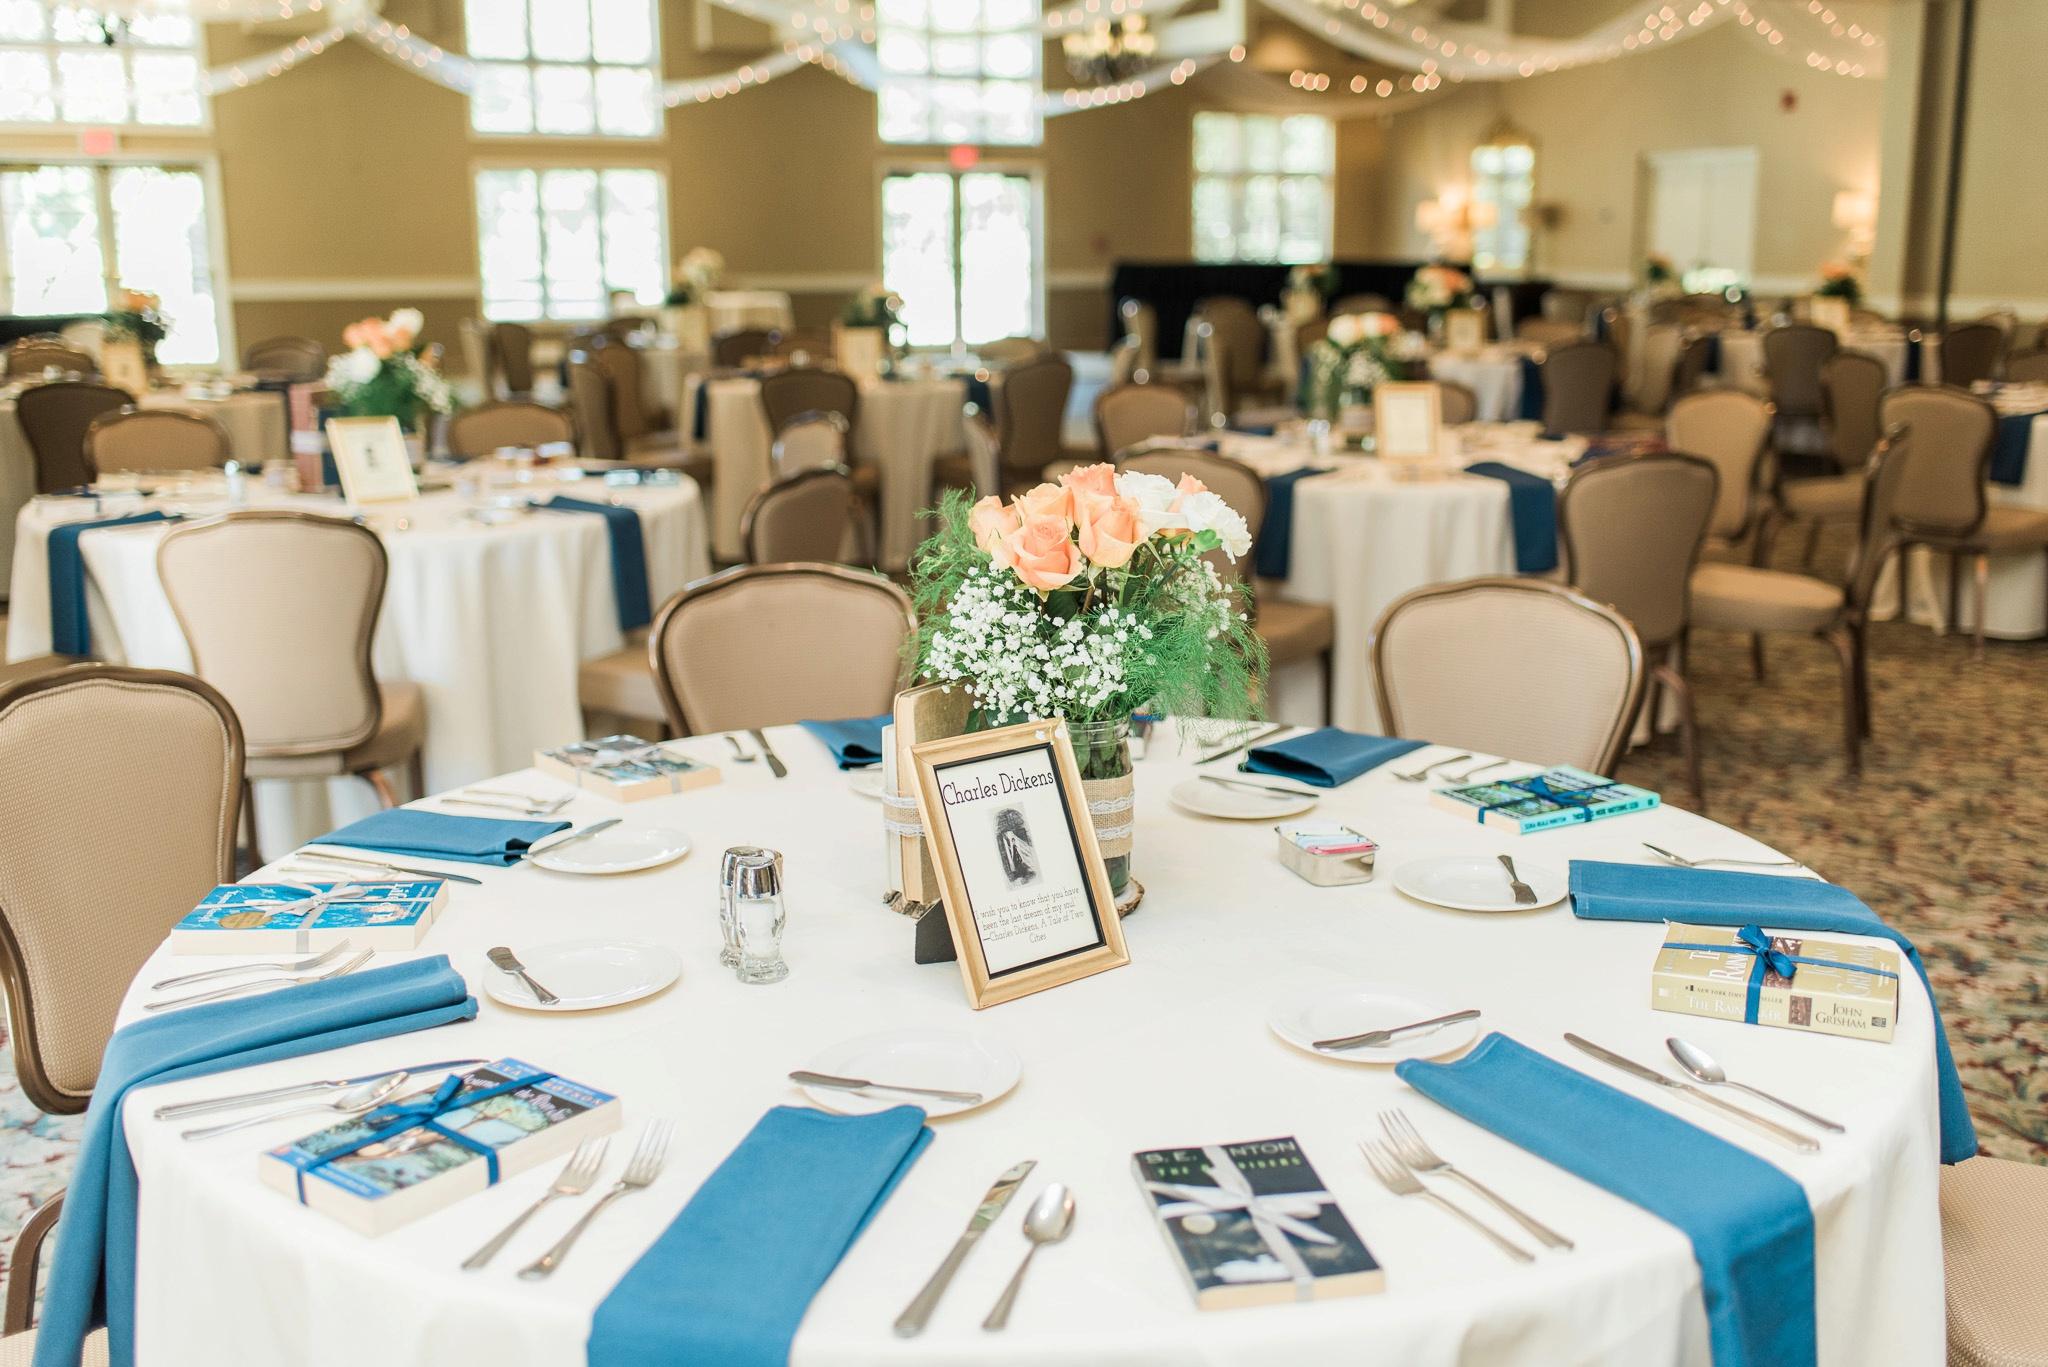 brookside-golf-country-club-wedding-columbus-ohio-16.jpg